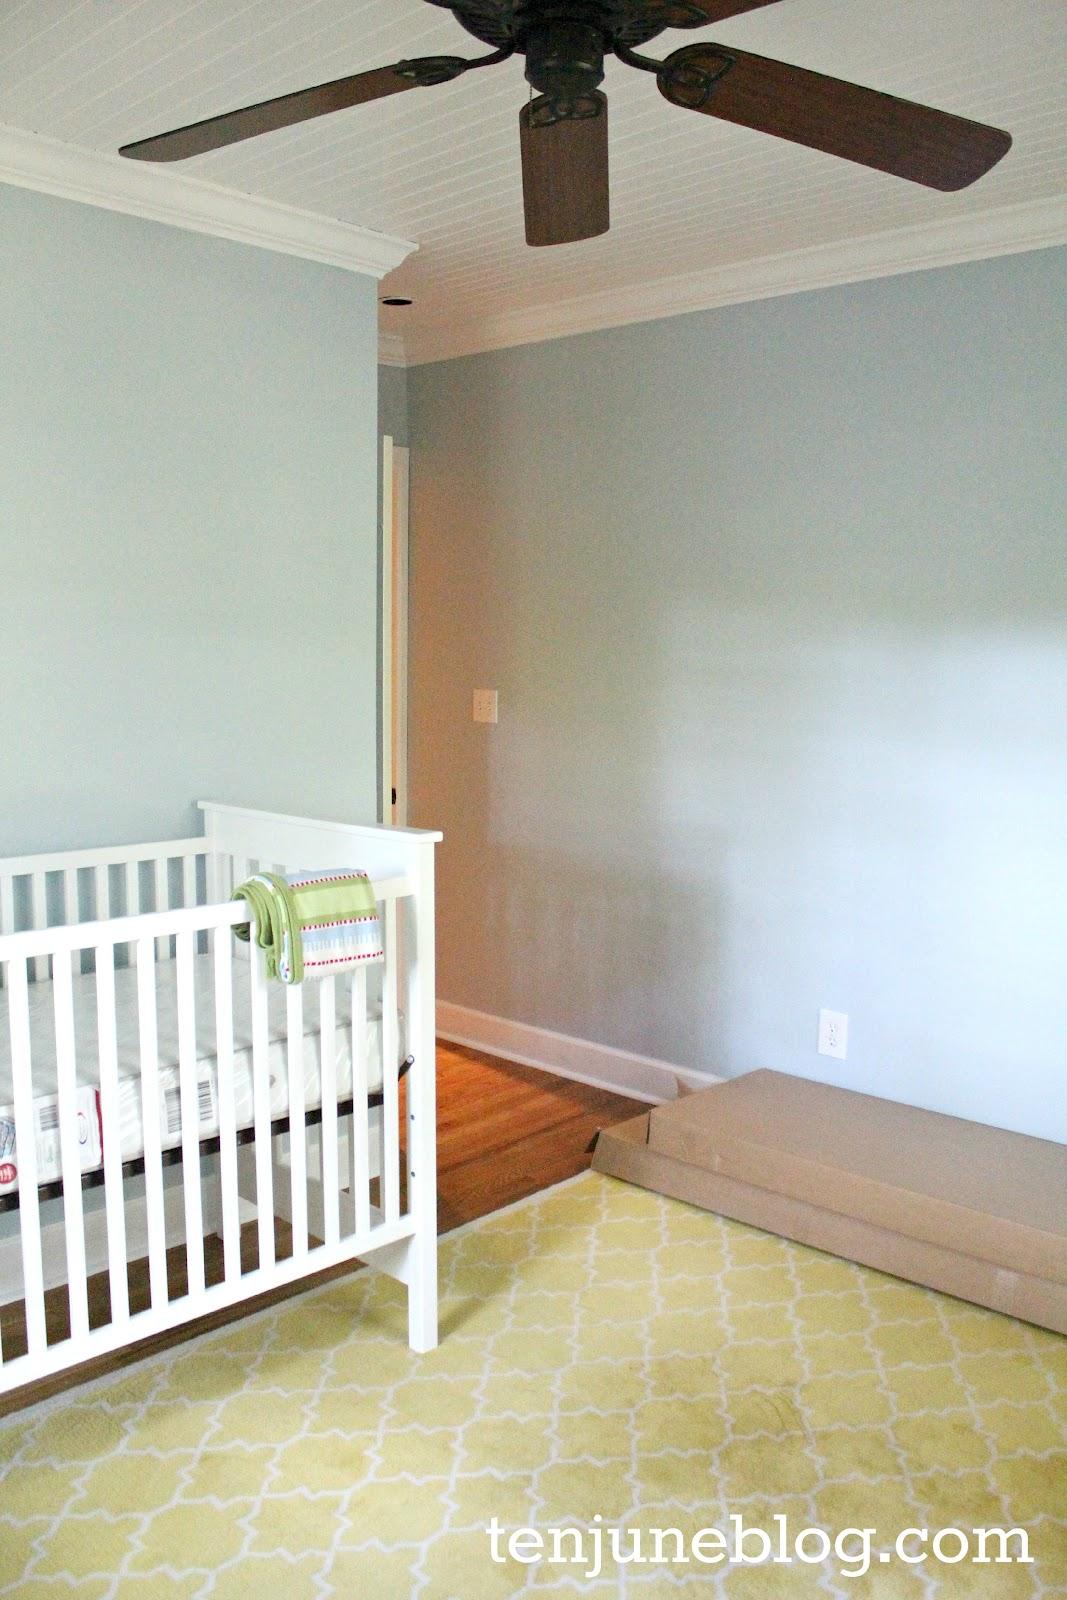 Ten June Nursery Update A Freshly Painted Baby Boy S Room Sherwin Williams Emerald Paint Review